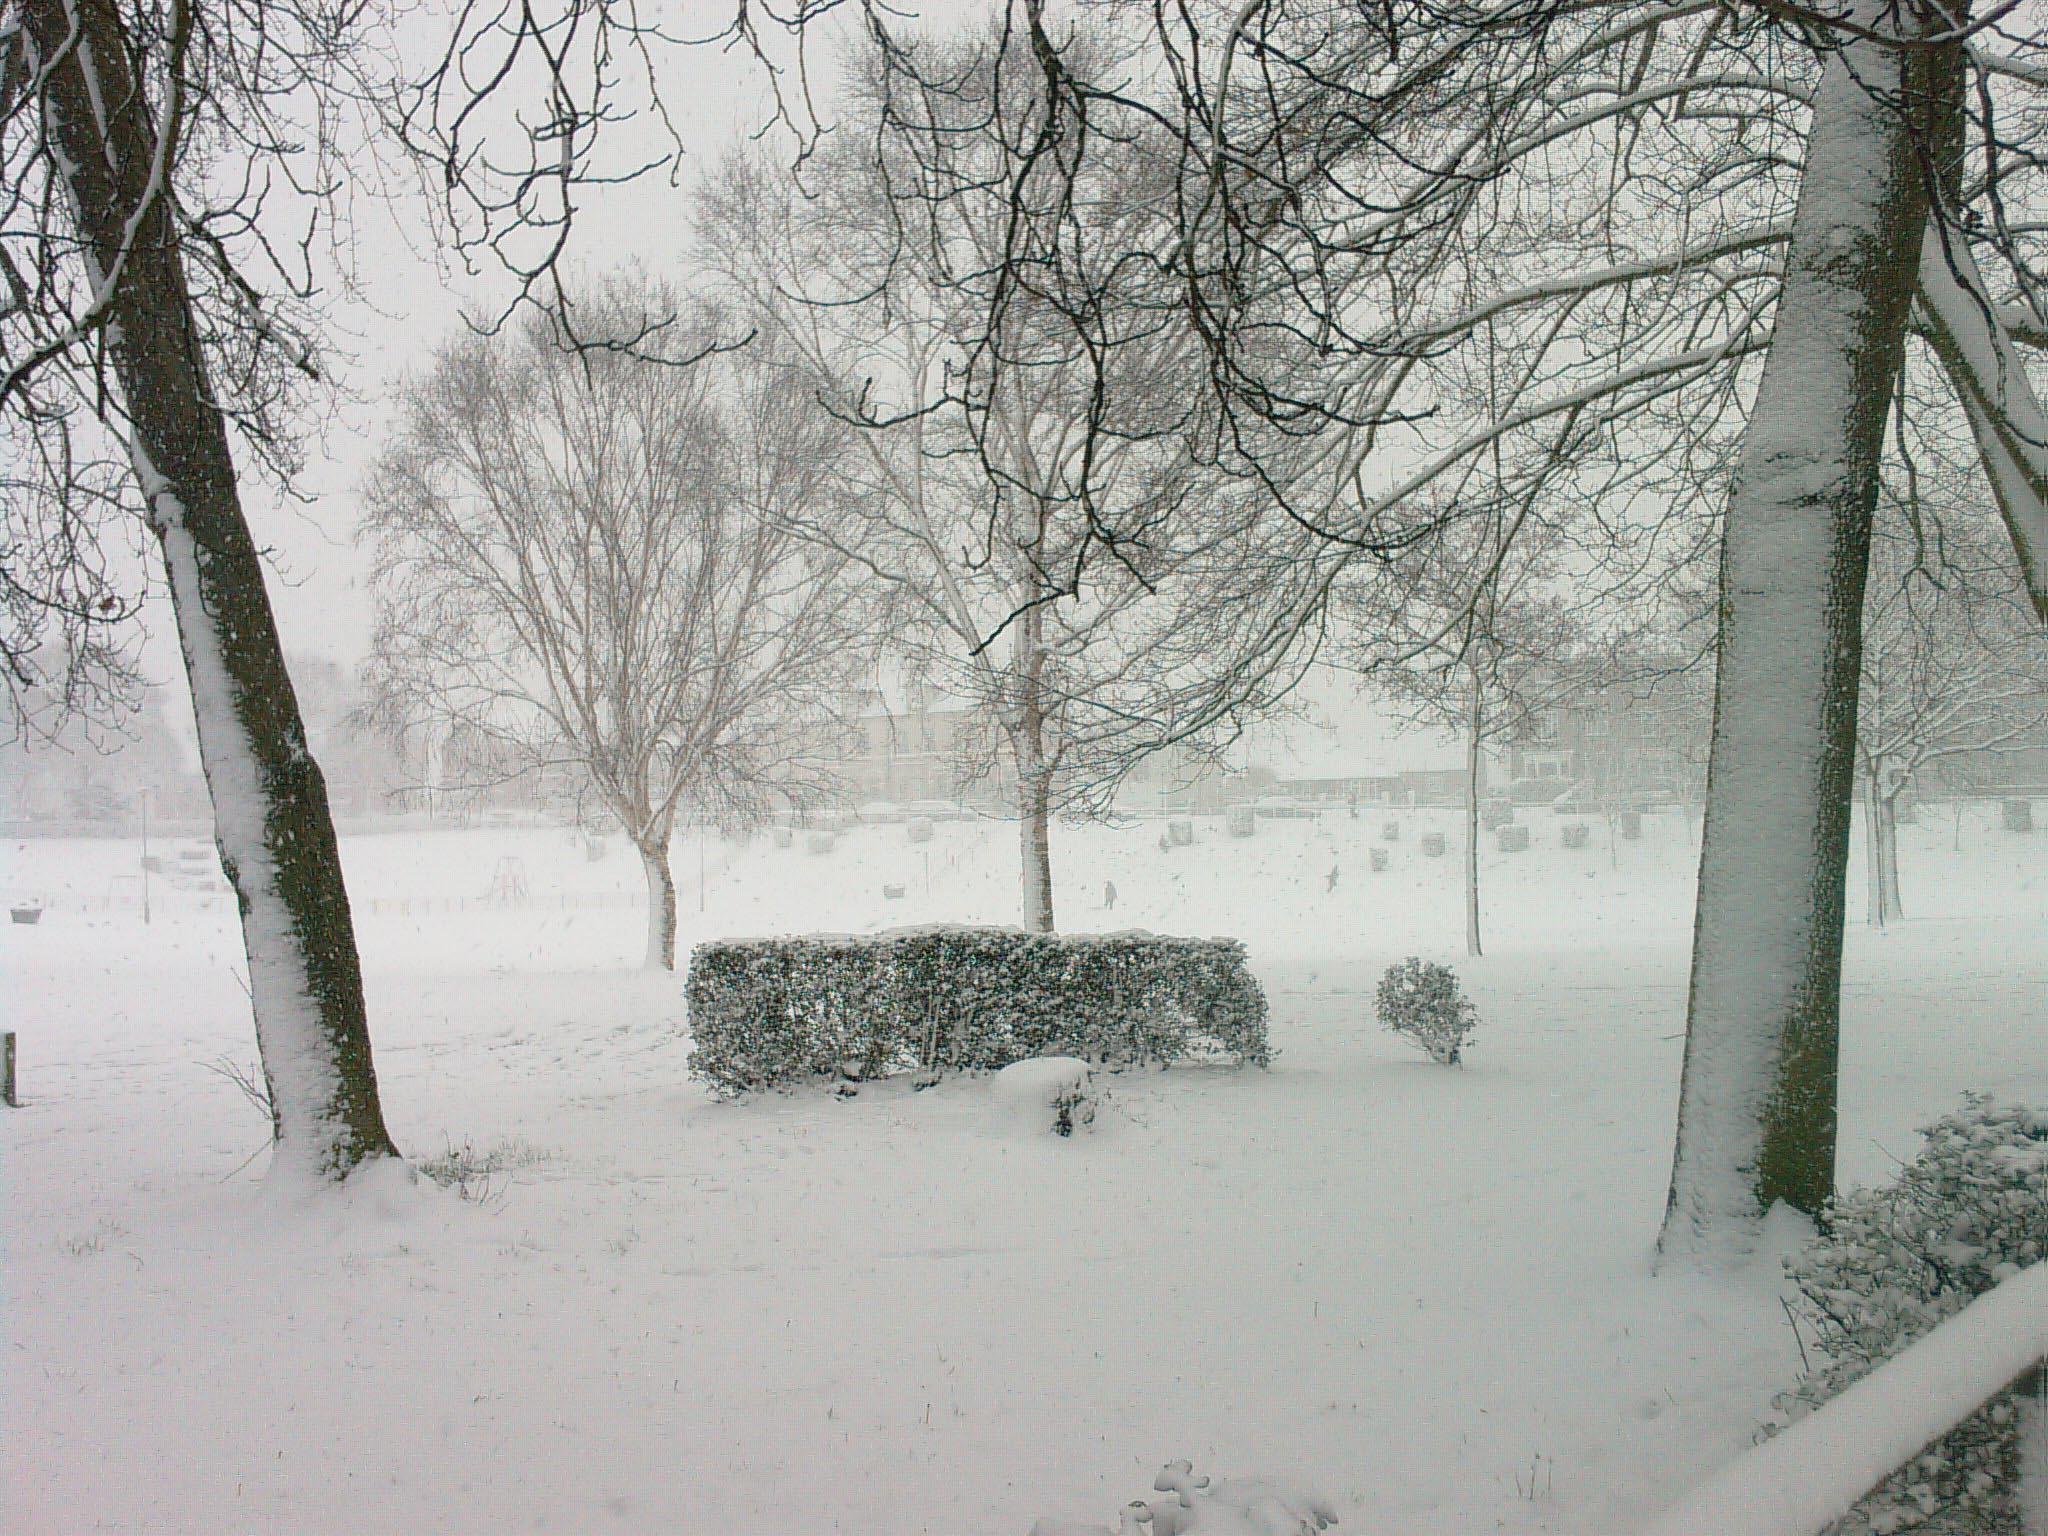 winter-snow-scene-christmas-2009.jpg